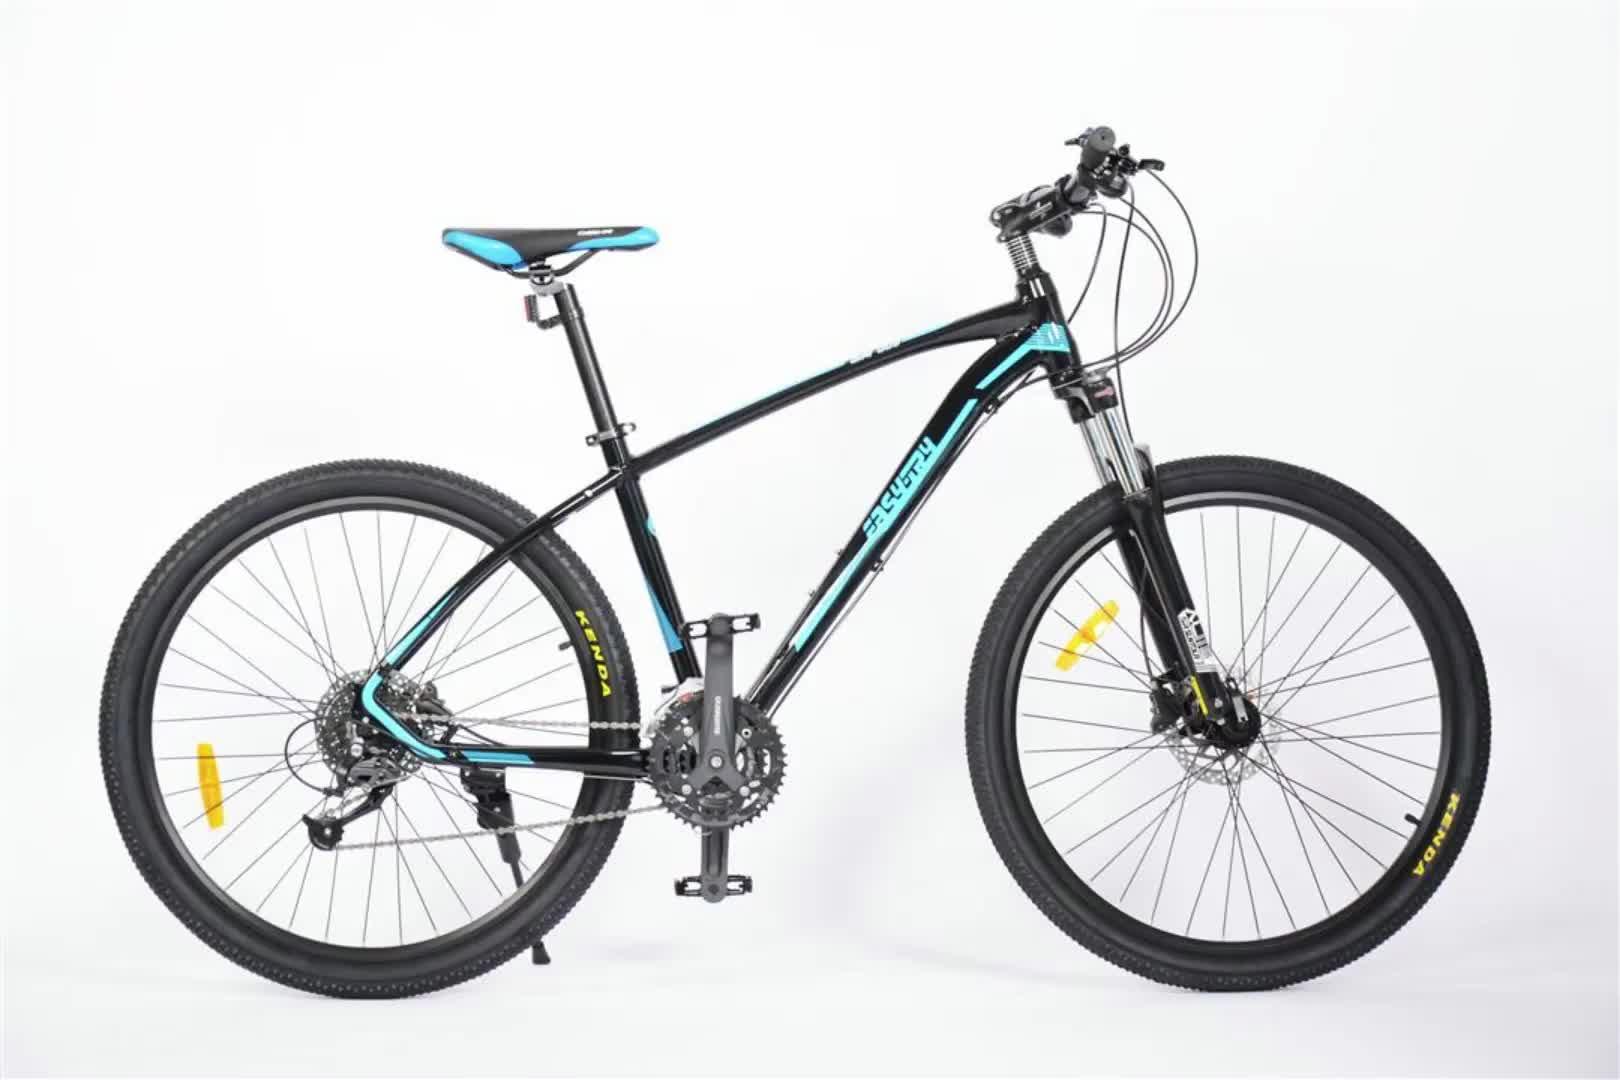 2018 Nieuwe Ontwerp Aluminium Frame Womens Mountainbike Fiets